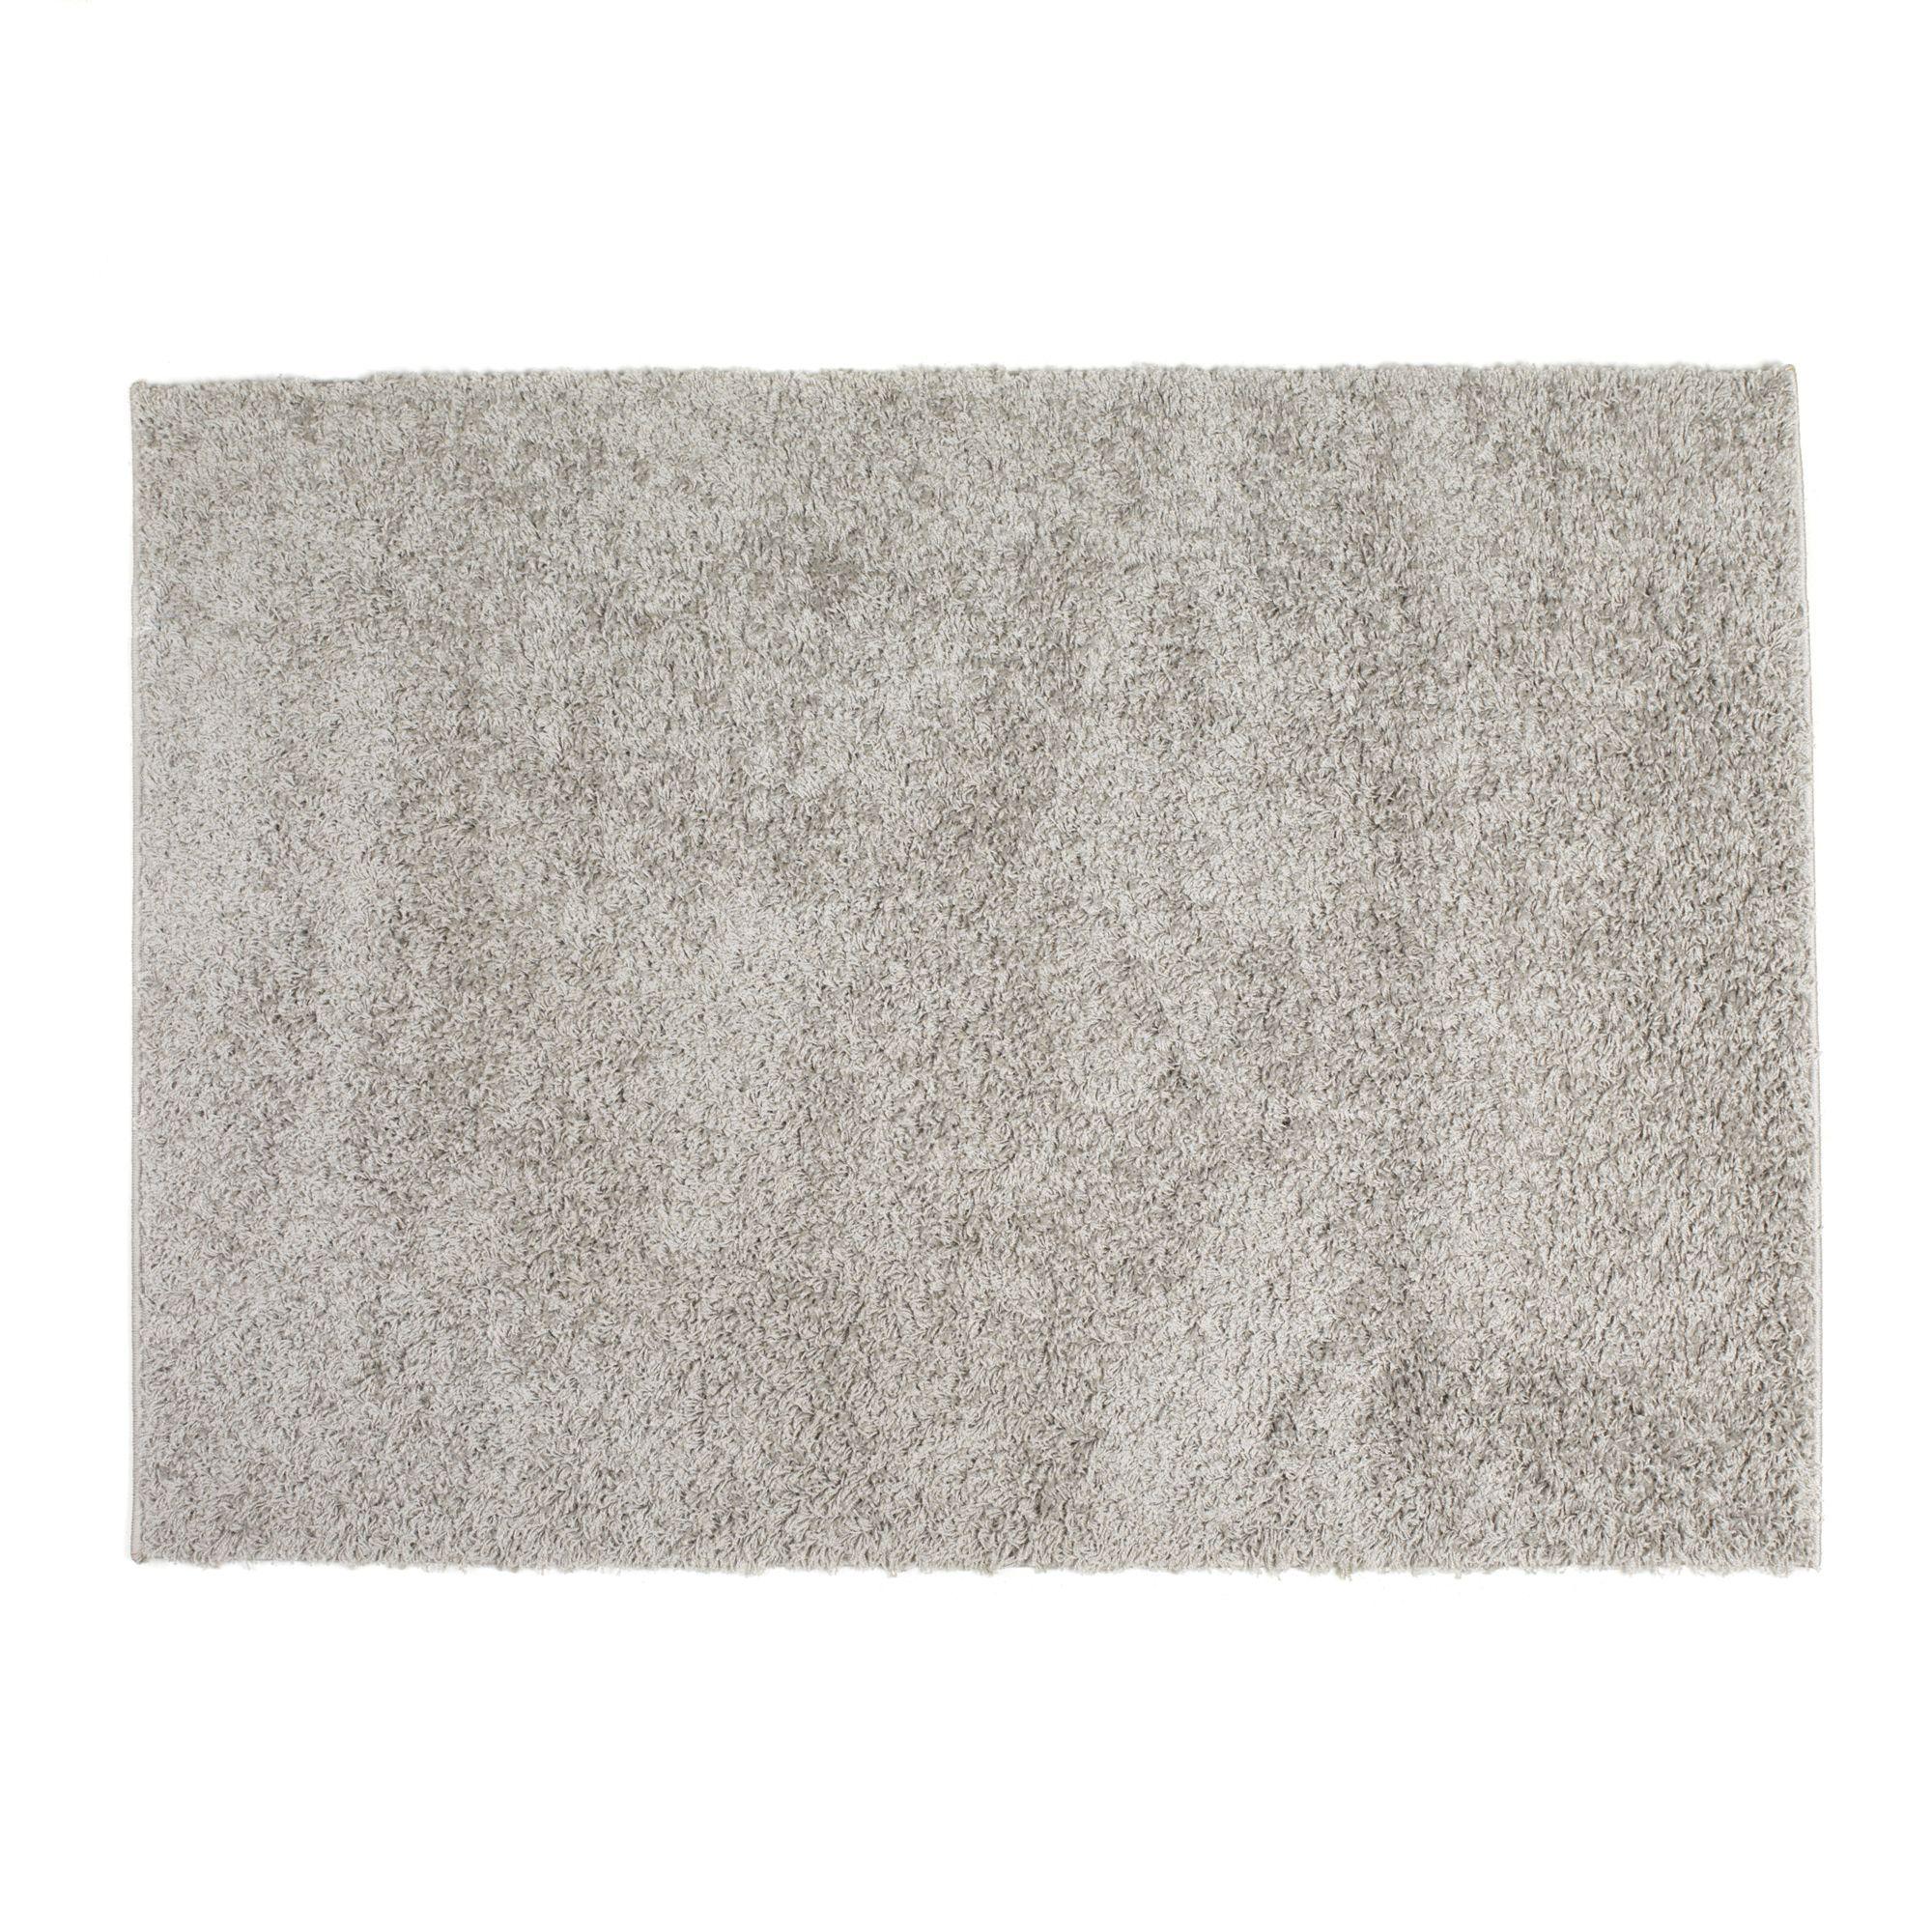 Tapis gris 120x170cm gris domino les tapis textiles - Tapis alinea salon ...